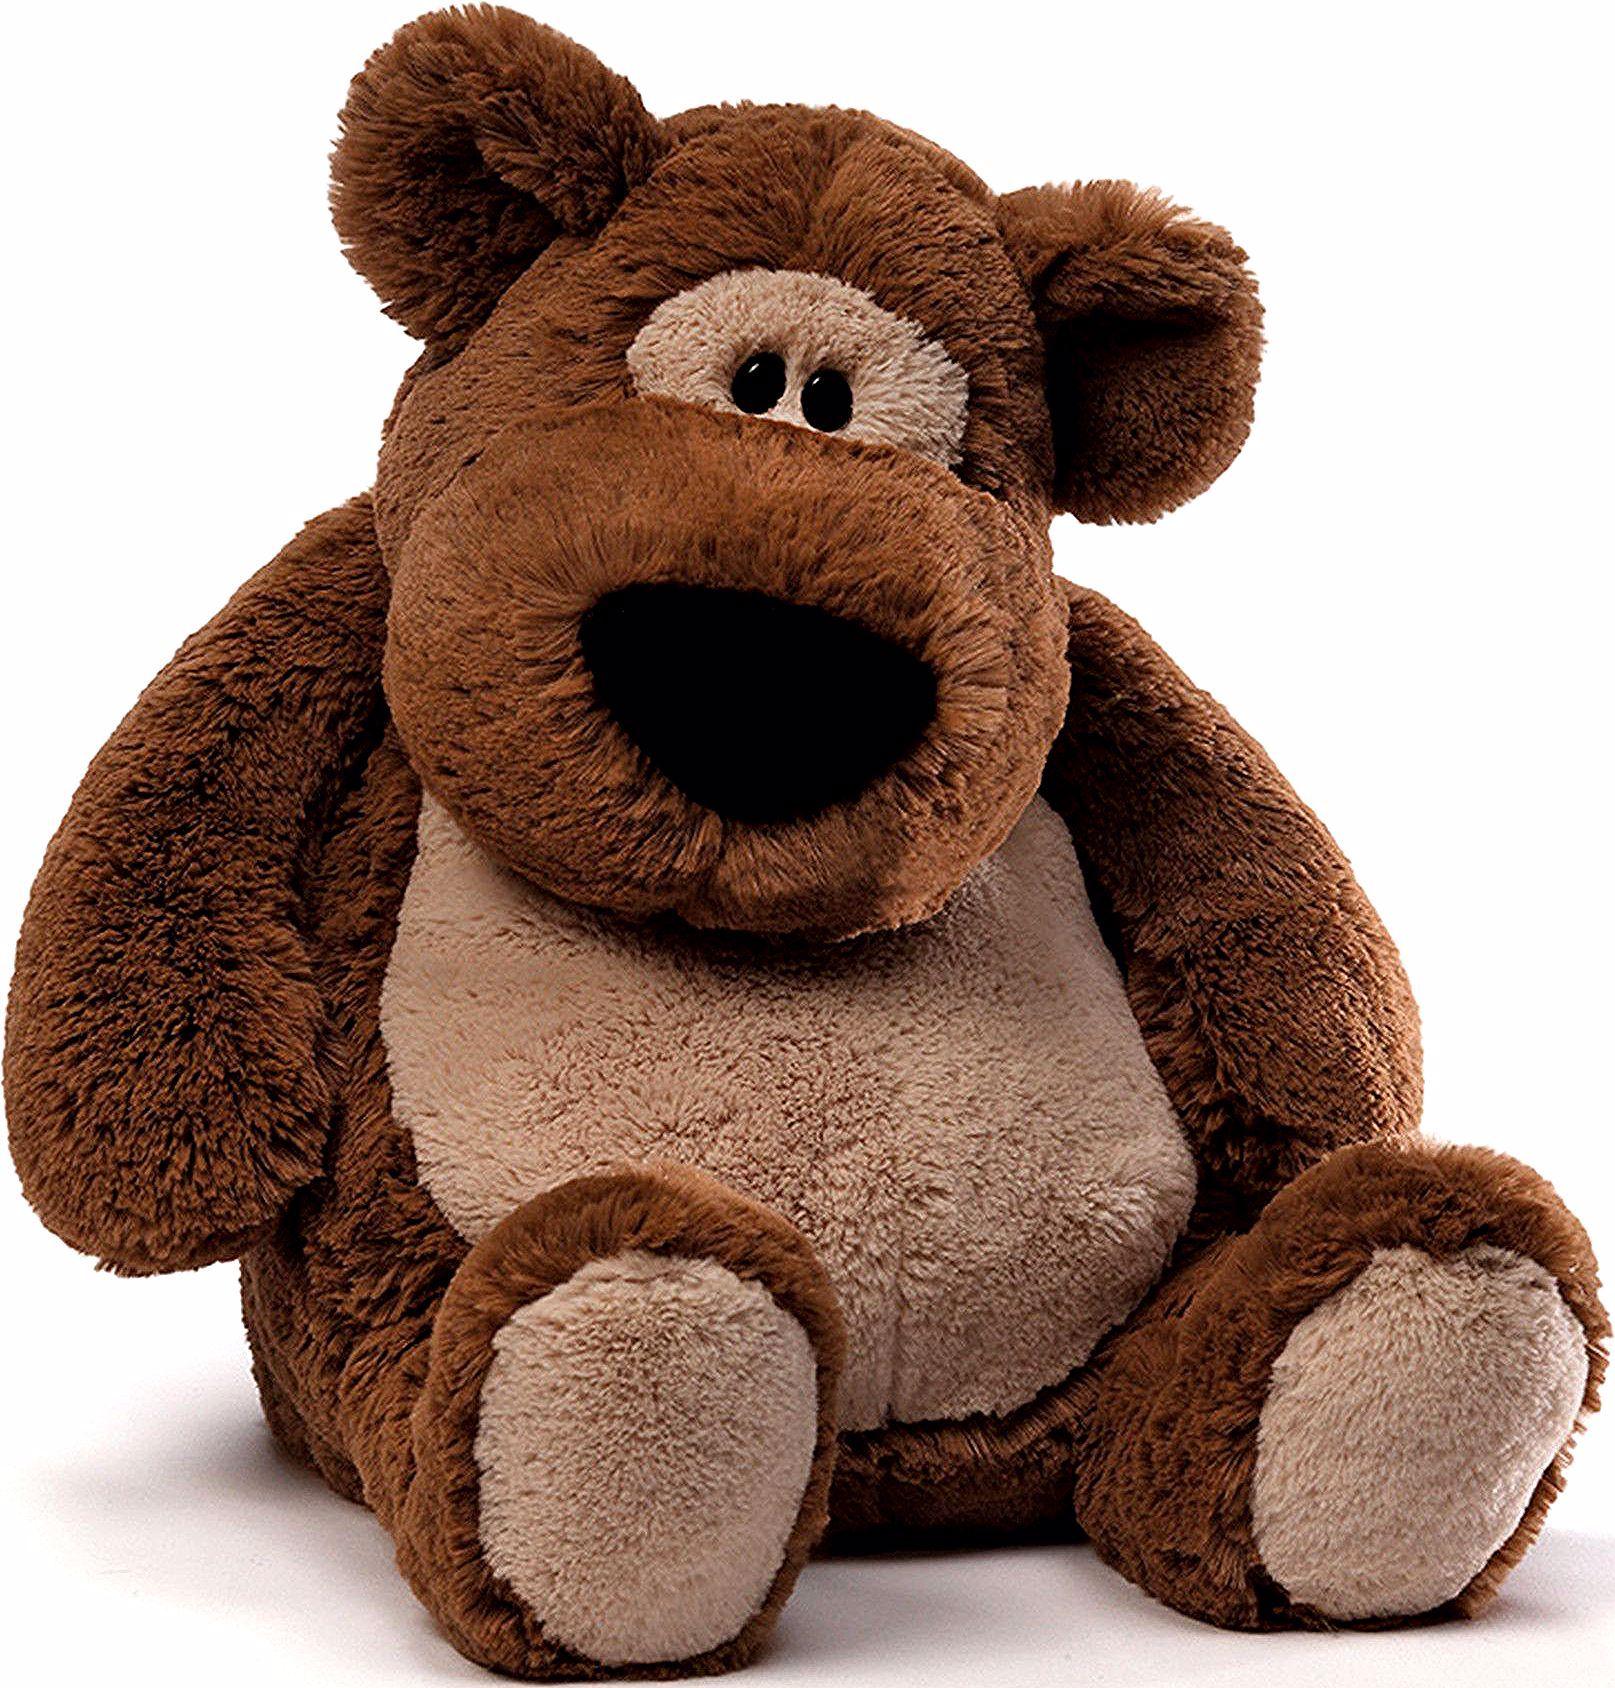 Gund Kaboodle Teddy Bear Stuffed Animal Monkey stuffed